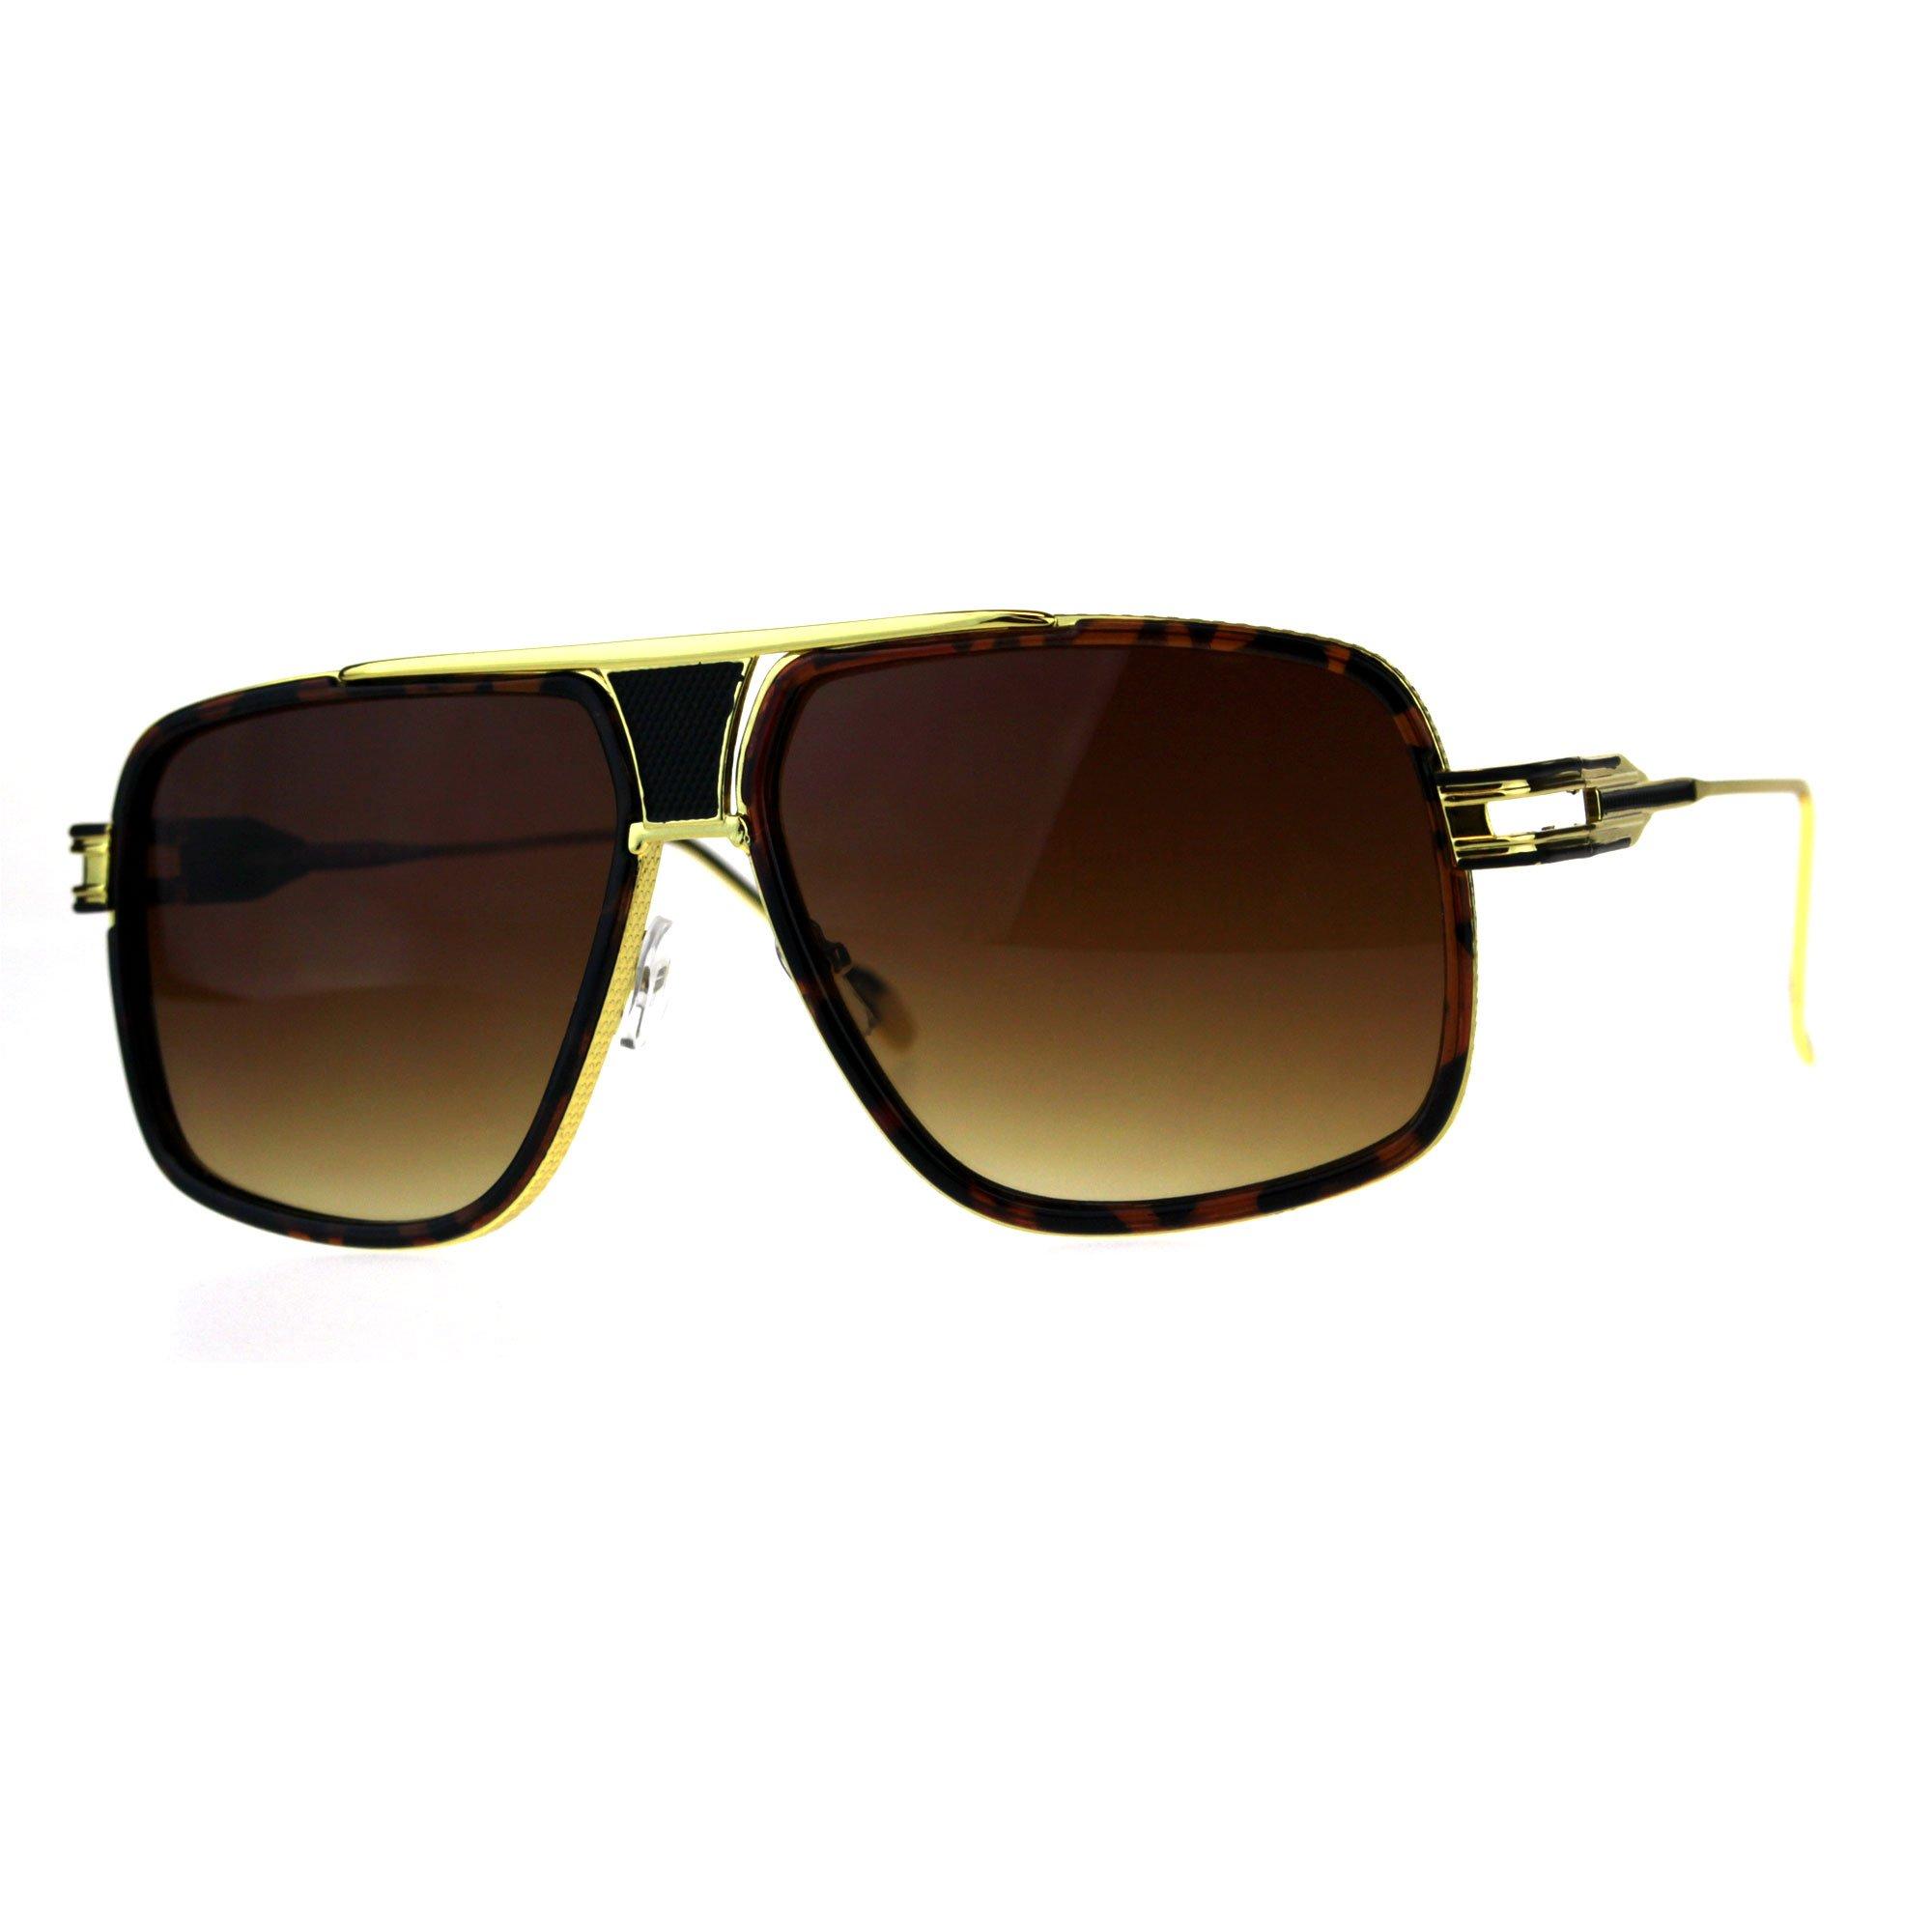 Oversize Luxury Mobster Racer Mens Designer Sunglasses Tortoise Gold Brown by SA106